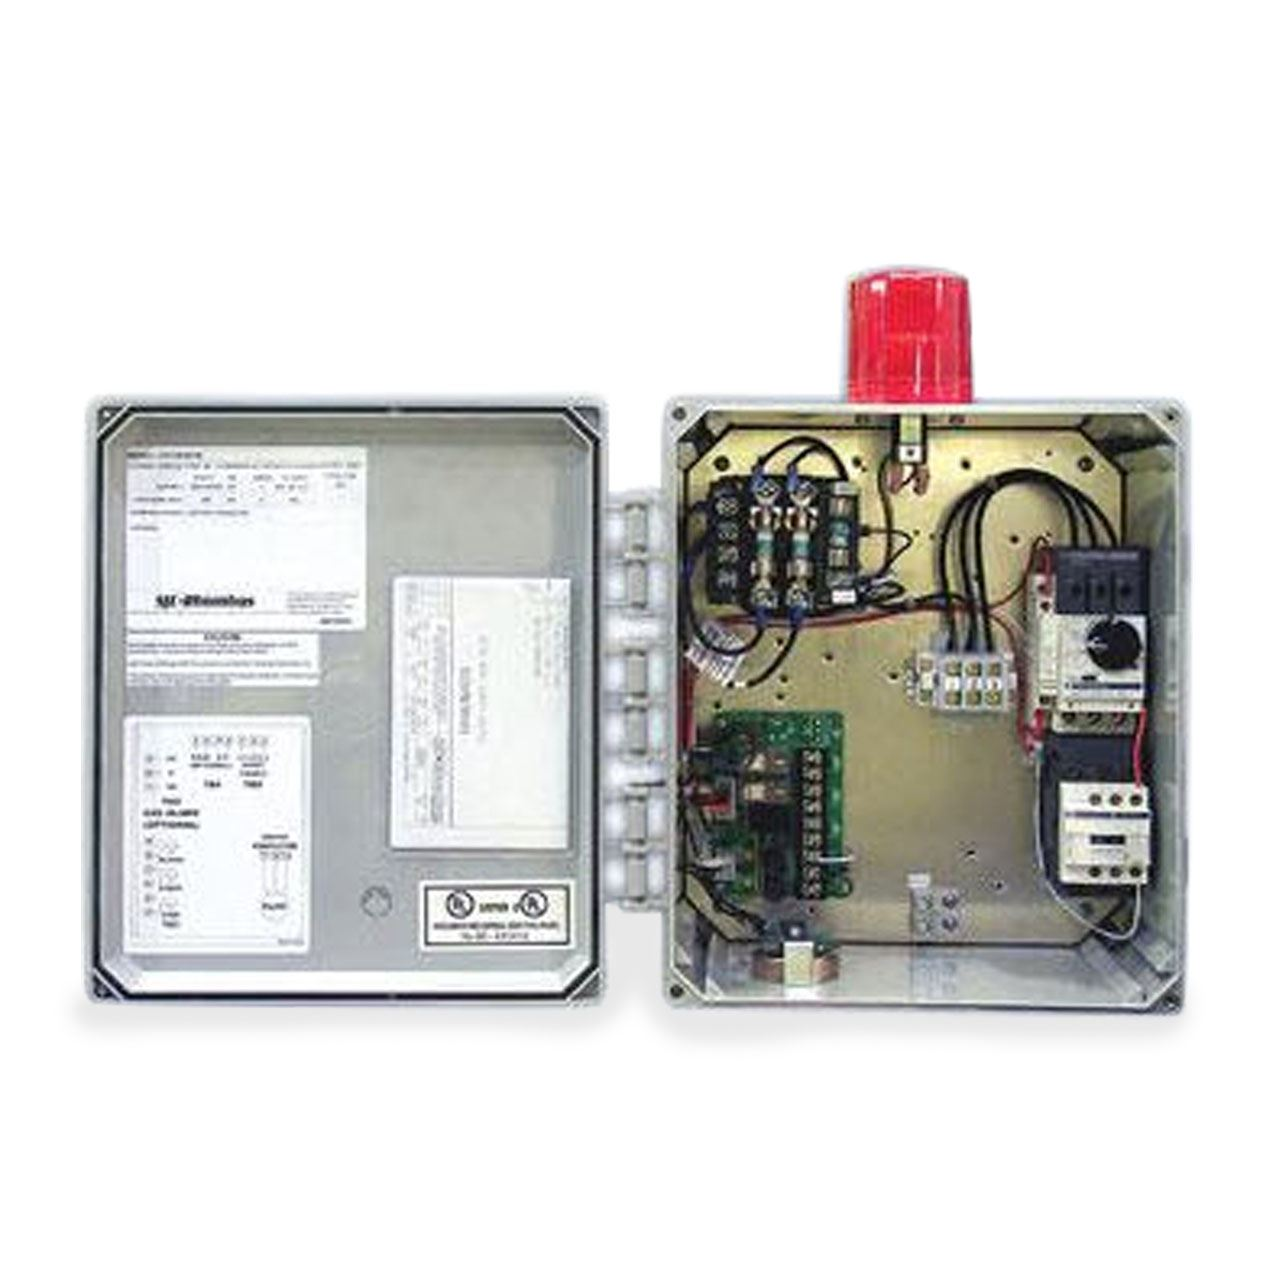 medium resolution of sje rhombus sje rhombus model 312 3 phase 208 240 480 600v simplexduplex motor starter wiring